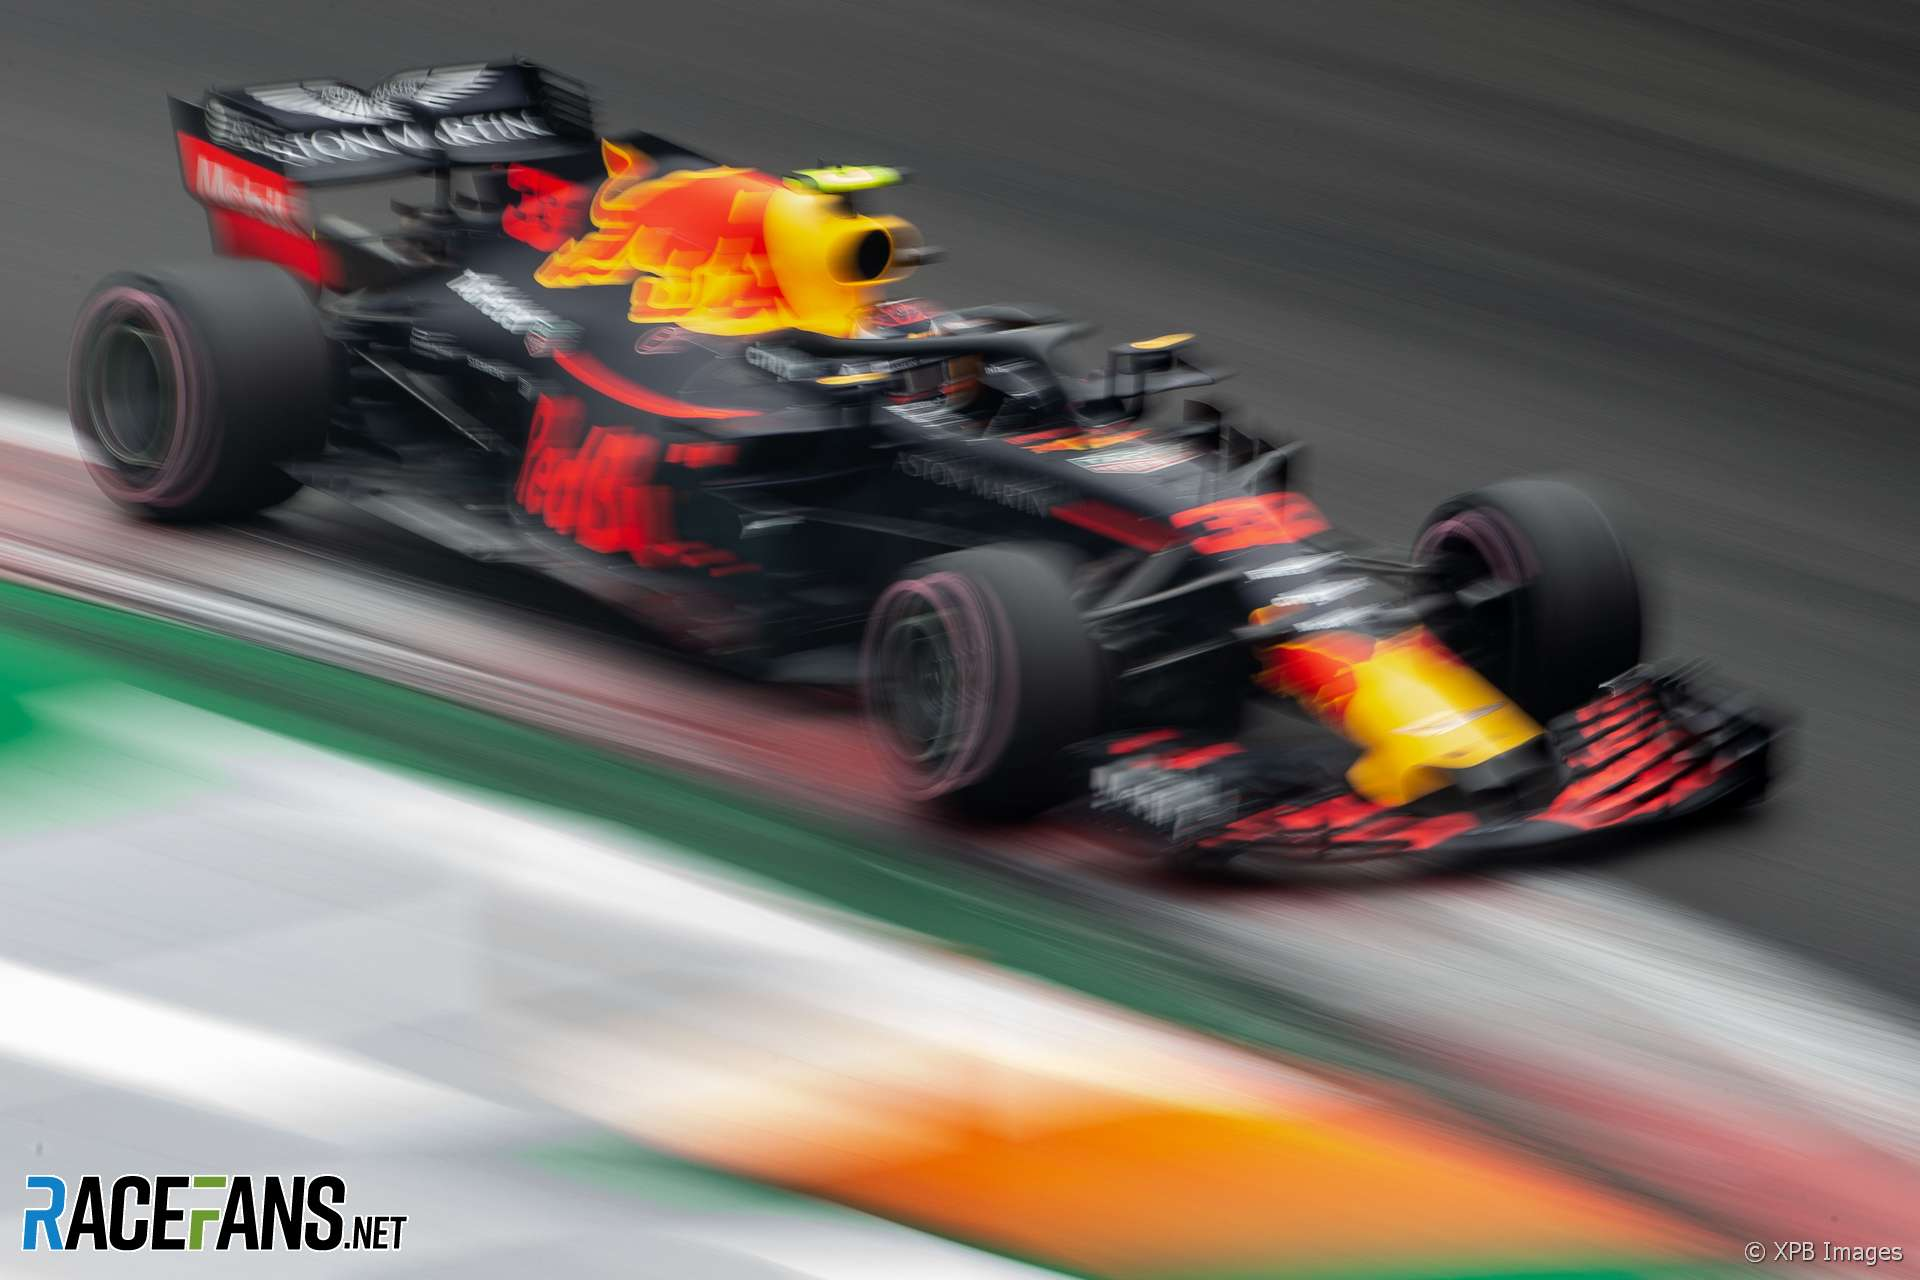 Max Verstappen, Red Bull, Autodromo Hermanos Rodriguez, 2018